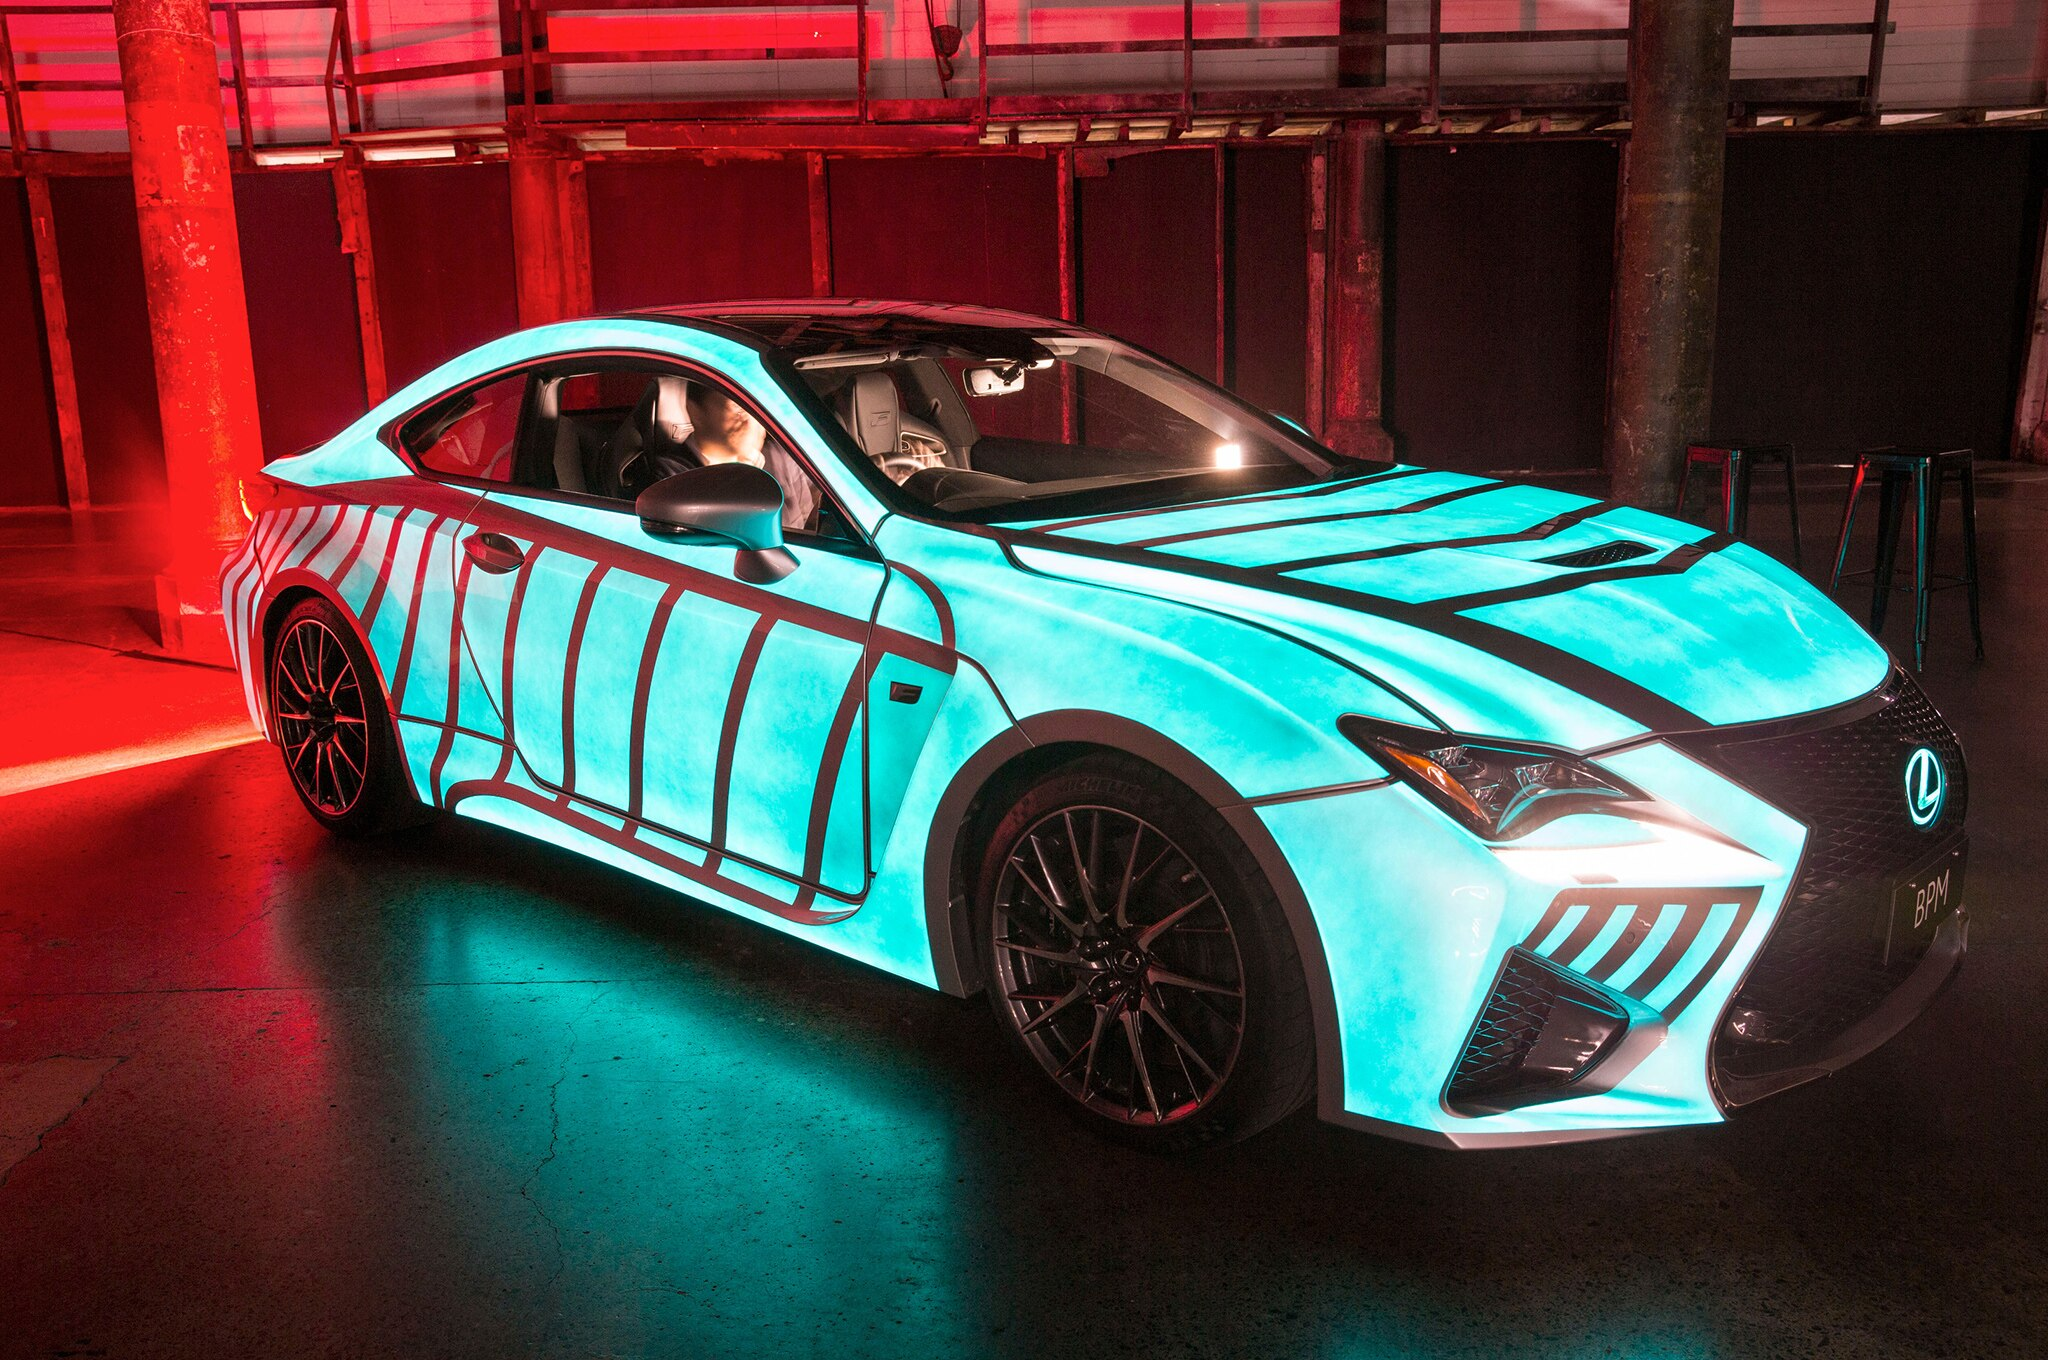 2015 Lexus RC F Heartbeat Car Front Three Quarter 1